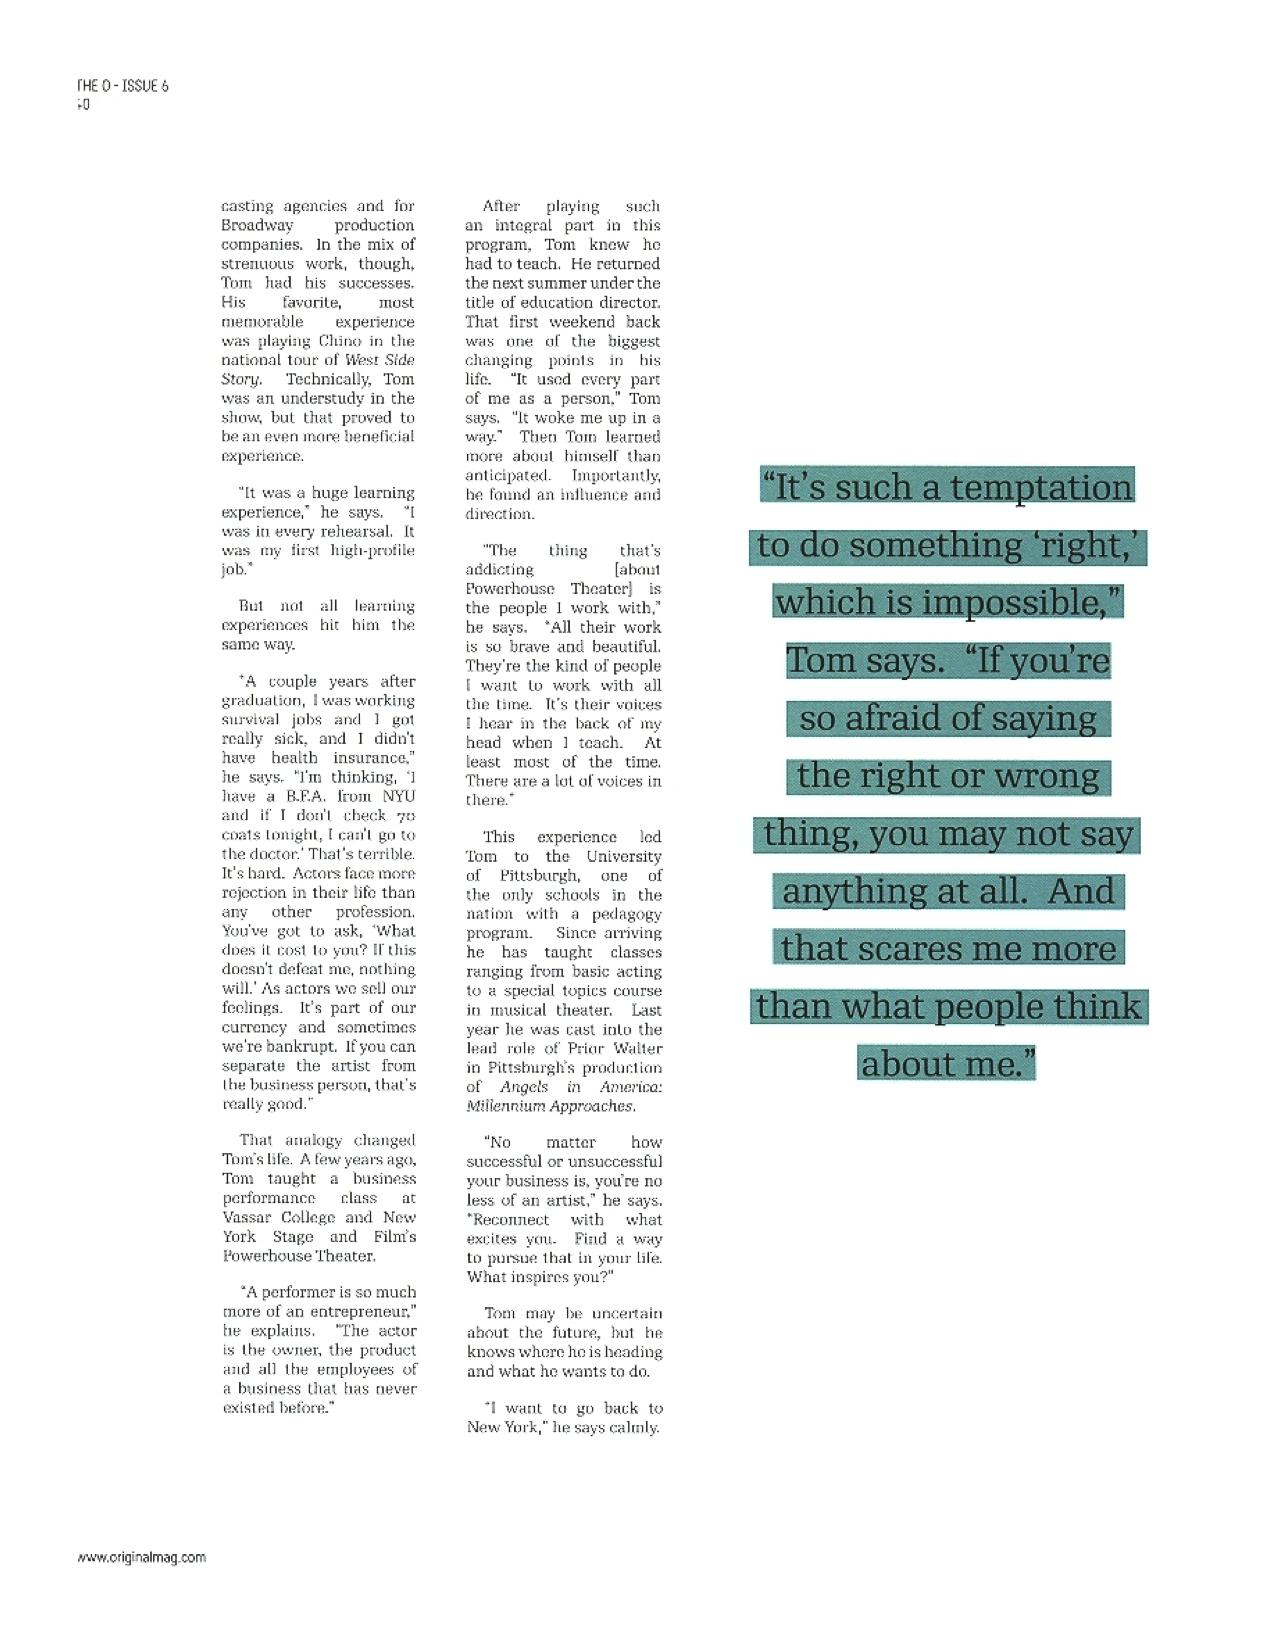 Tom-Pacio-Article3.jpg